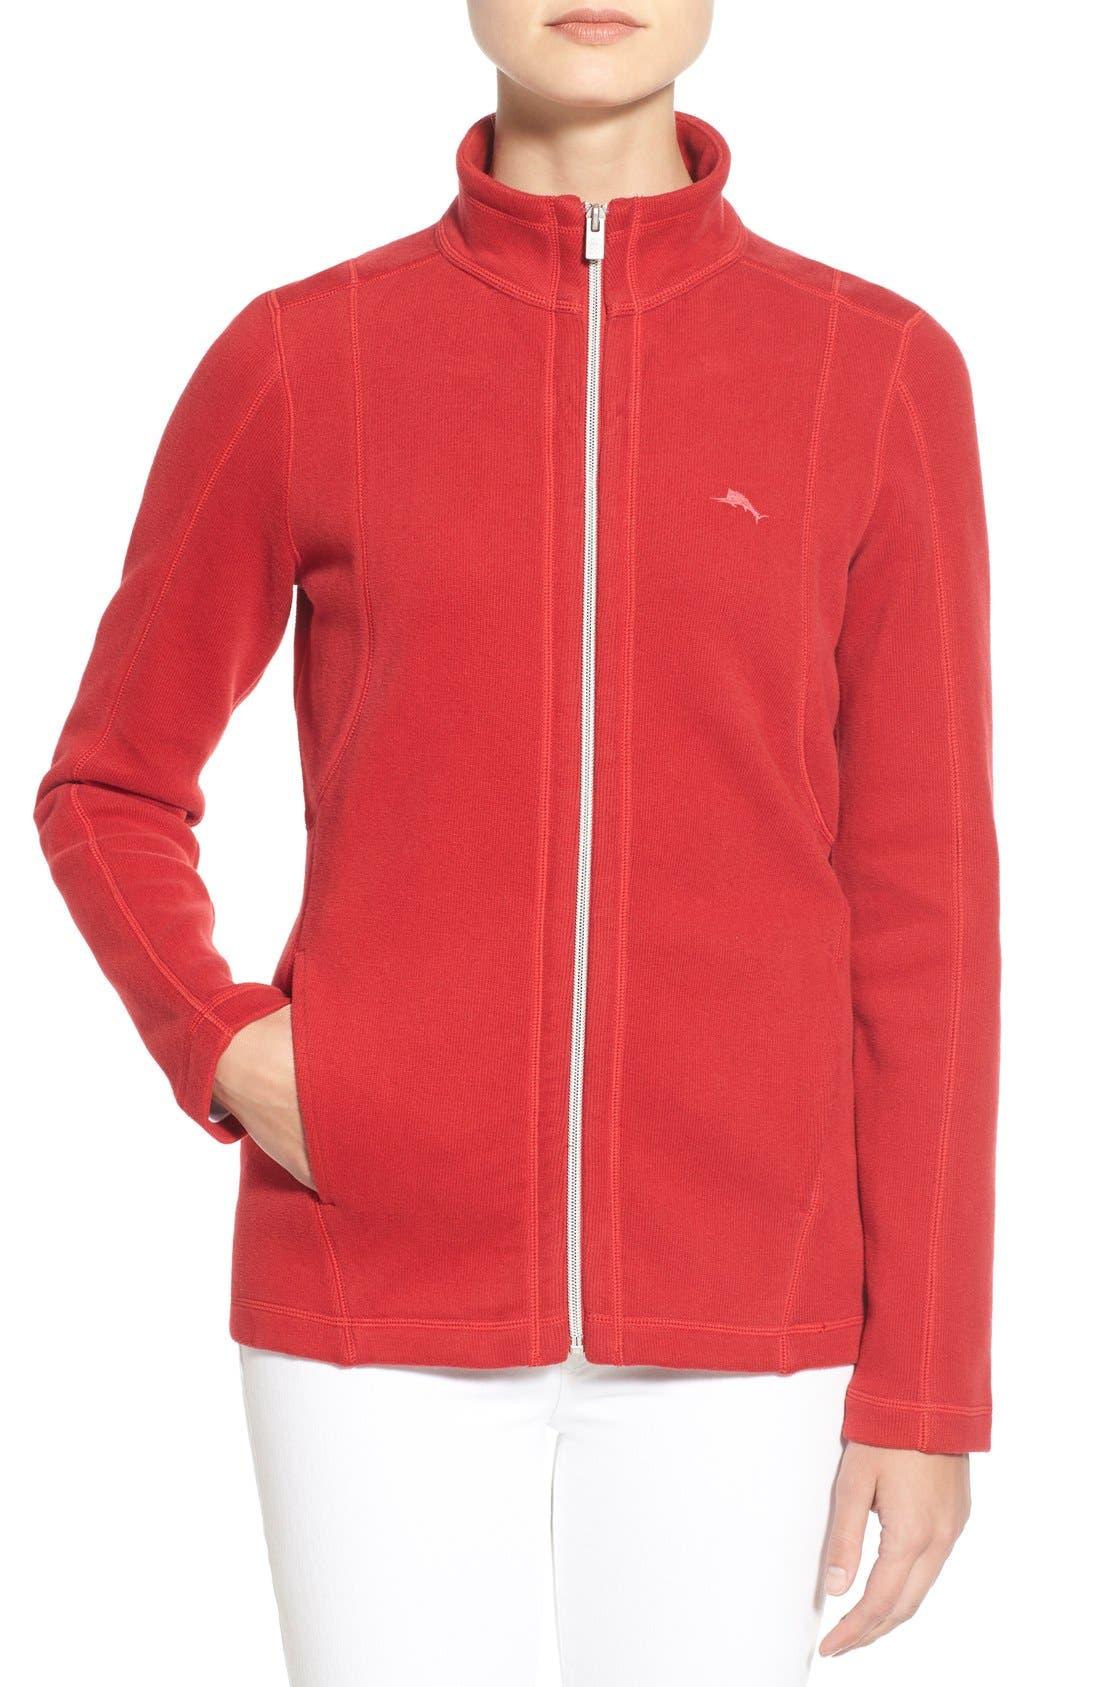 'Aruba' Full Zip Sweatshirt,                             Main thumbnail 5, color,